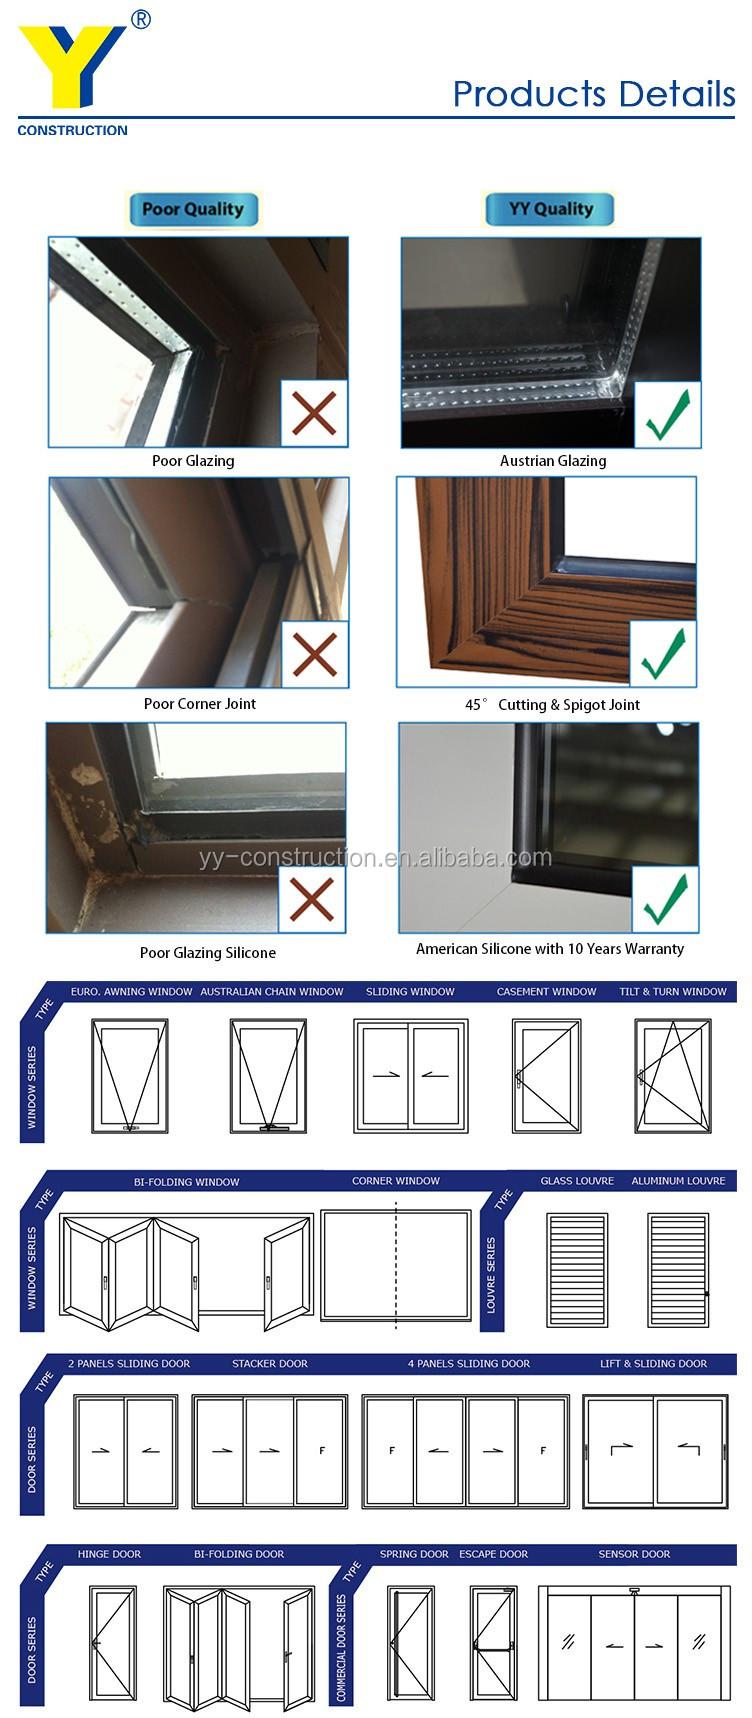 Turn tilt pvc window single casement window china for Window manufacturers nz